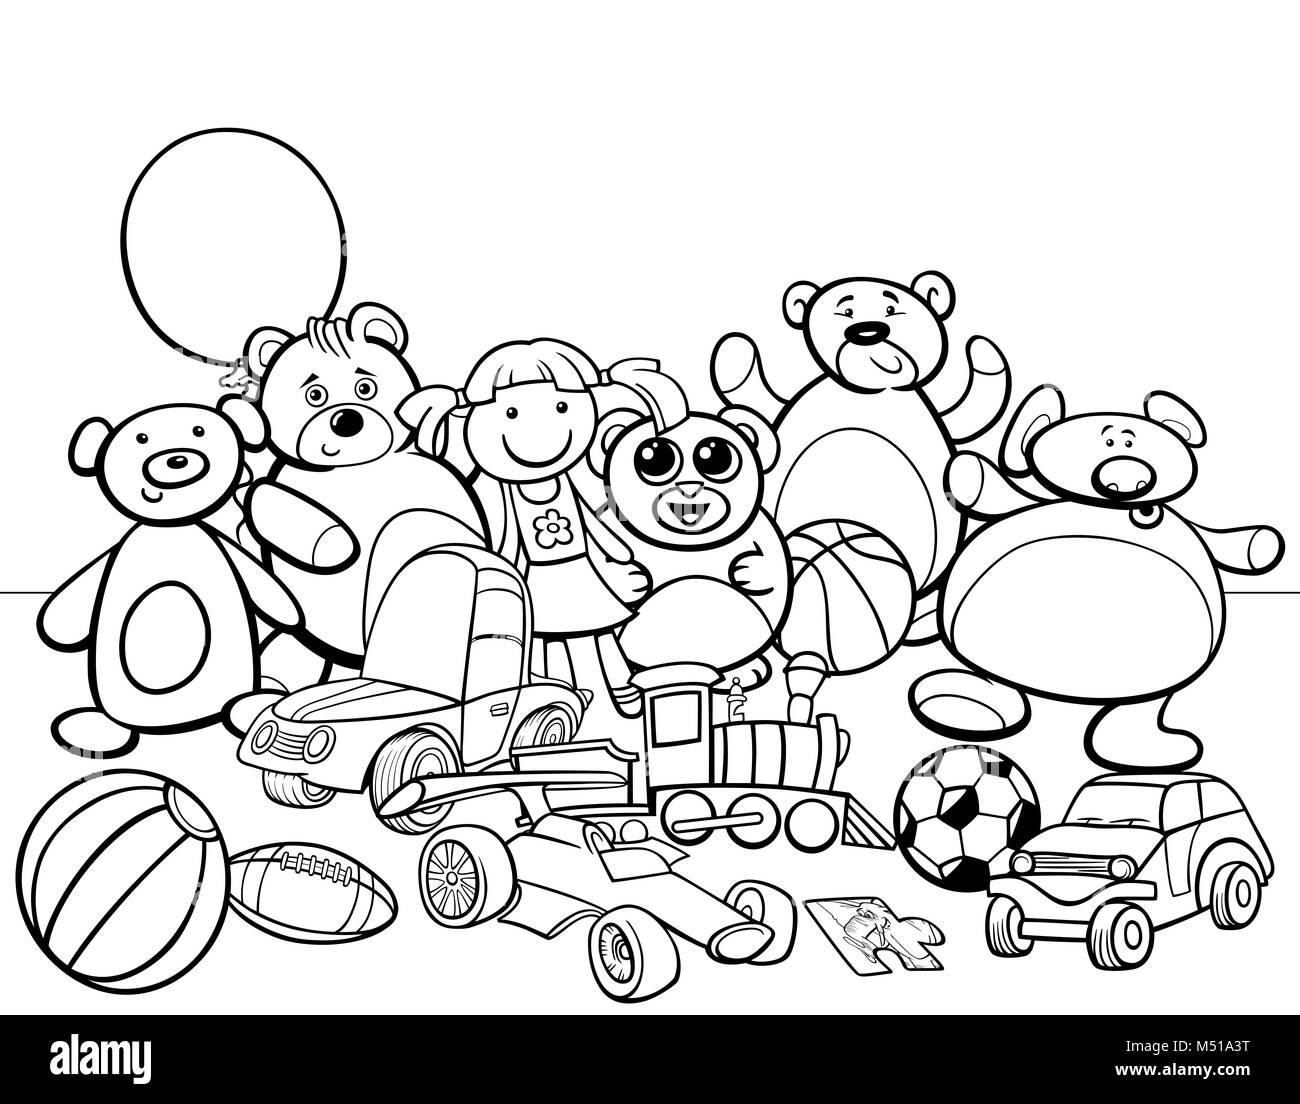 Toys Group Cartoon Coloring Book Stock Photo